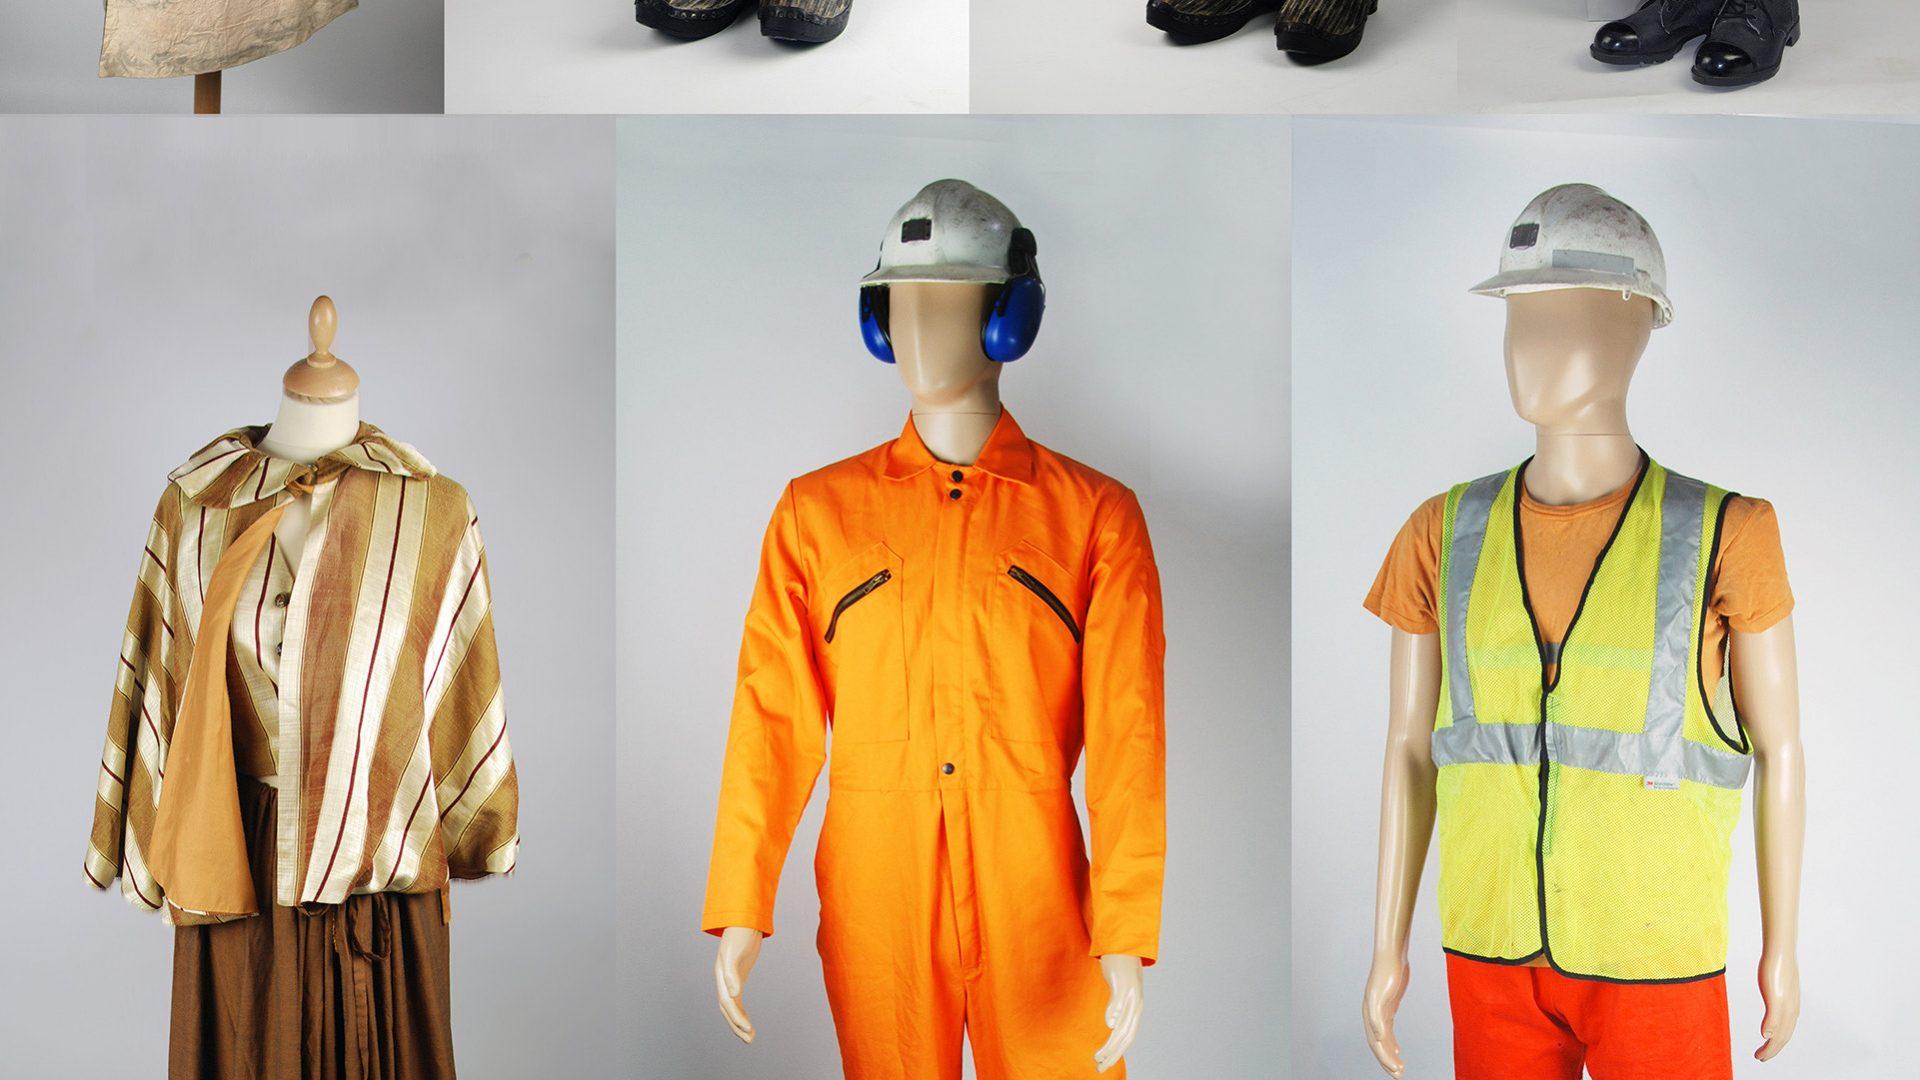 Mining Dress-up Loan Box